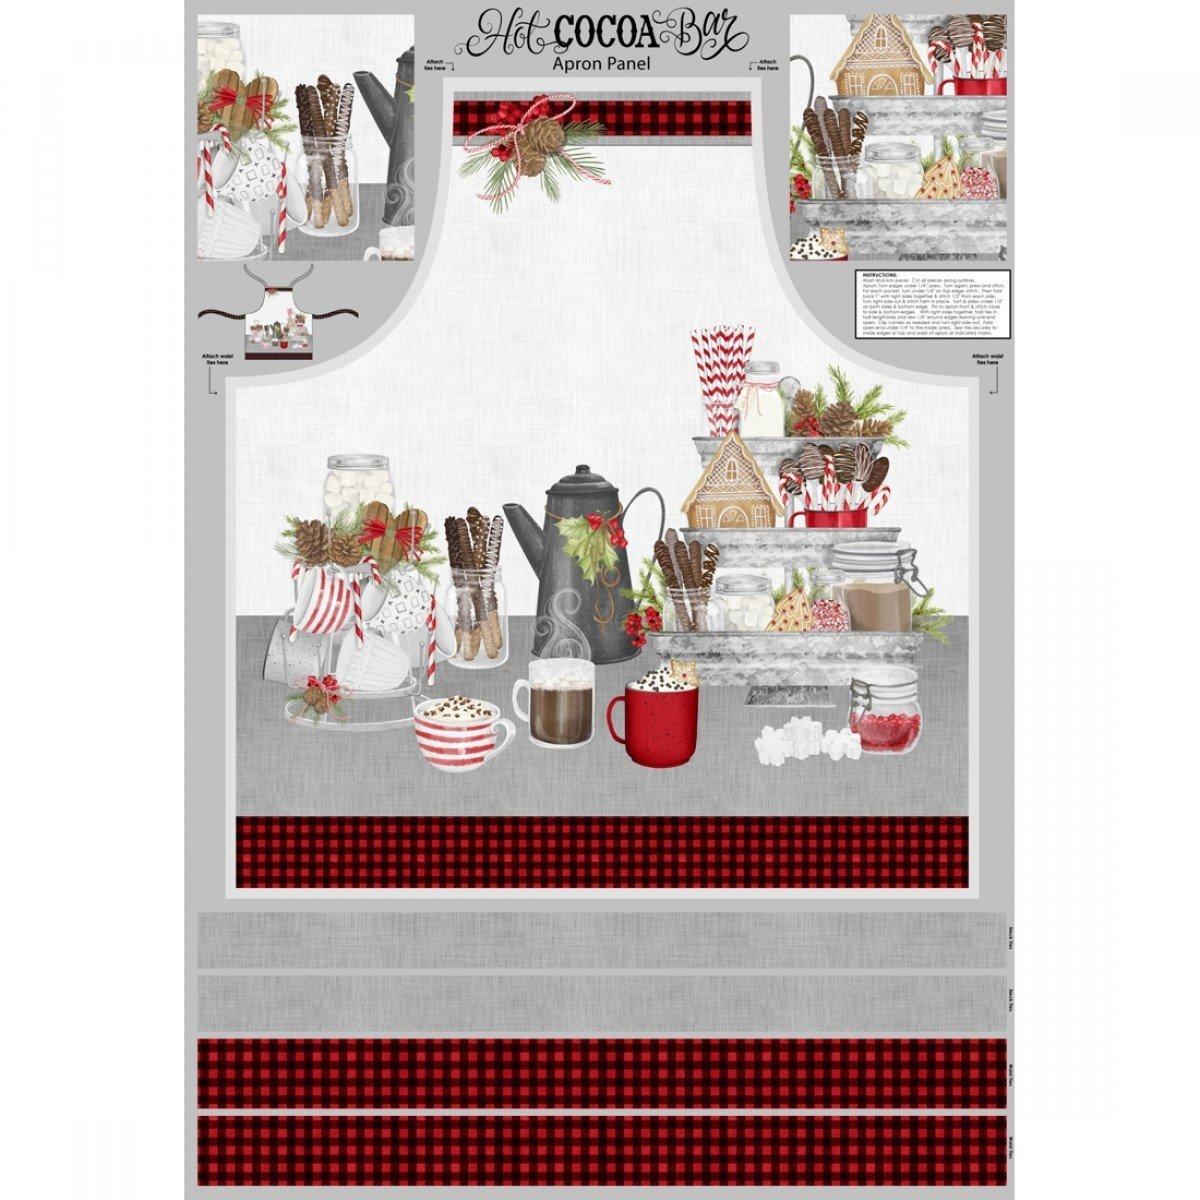 Hot Cocoa Bar Apron Kit - Plaid lining